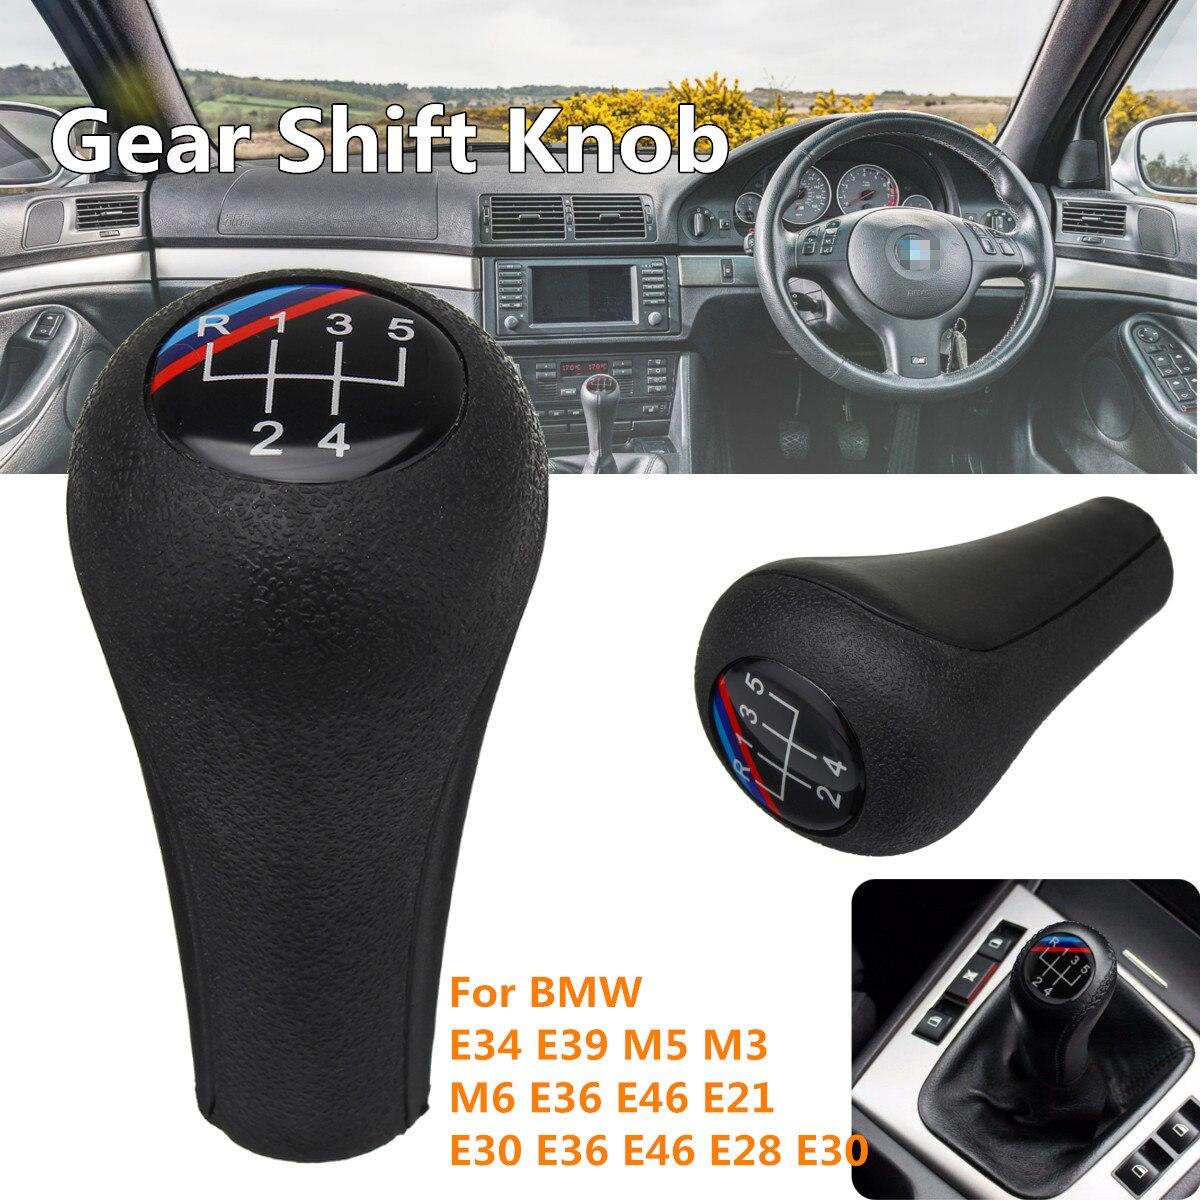 5 velocidad MT Car Gear Shift Knob Auto Shifter Knob Head para BMW E34 E39 M5 M3 M6 E36 E46 e21 E30 E36 E46 E28